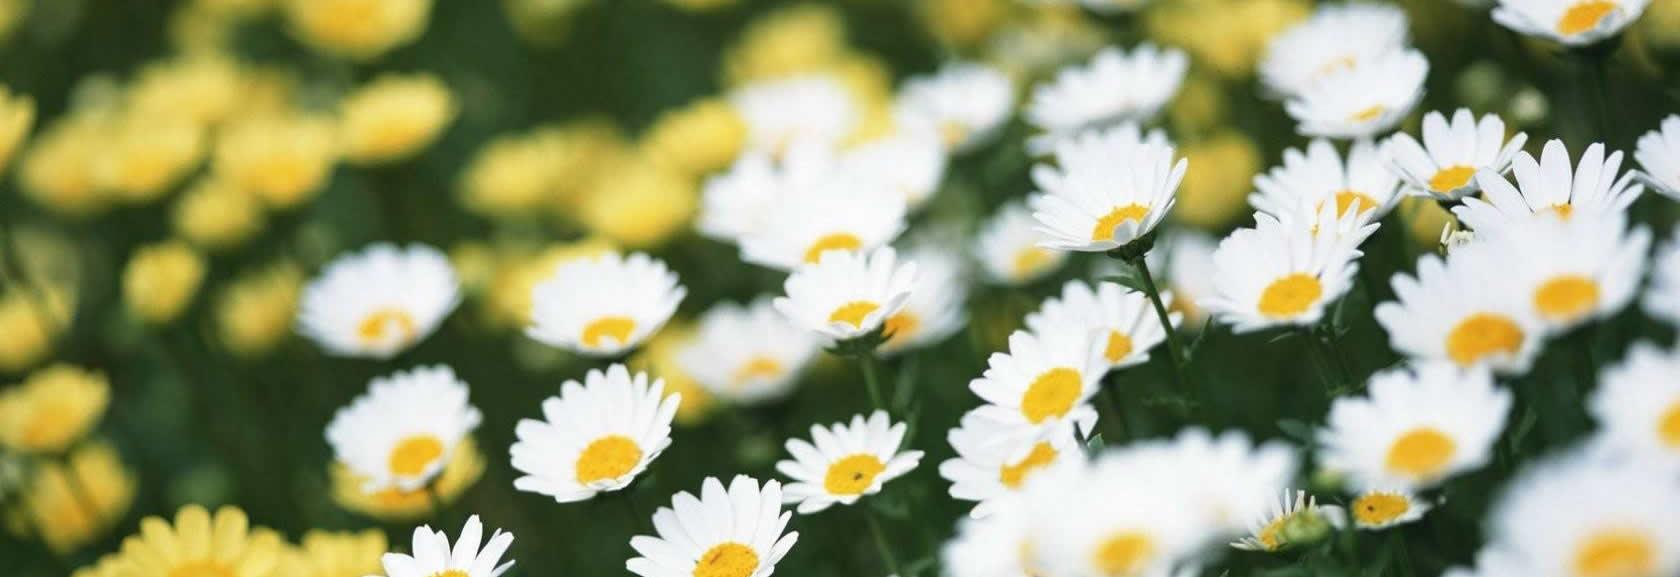 daisies header